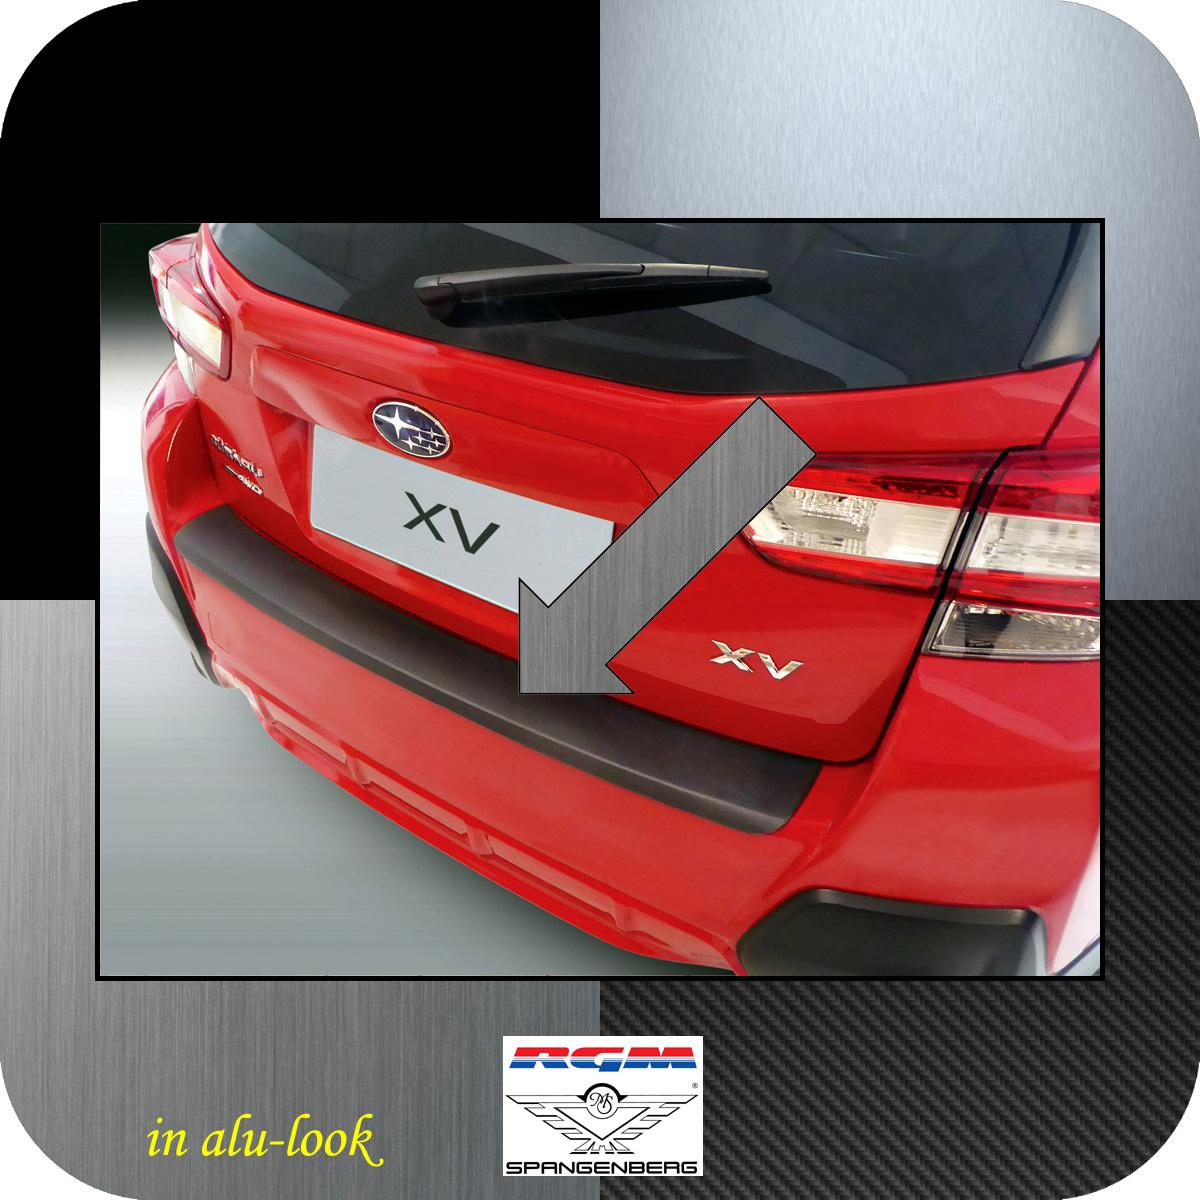 Ladekantenschutz Alu-Look für Subaru XV 2. Generation ab Bj. 12.2017- 3504823